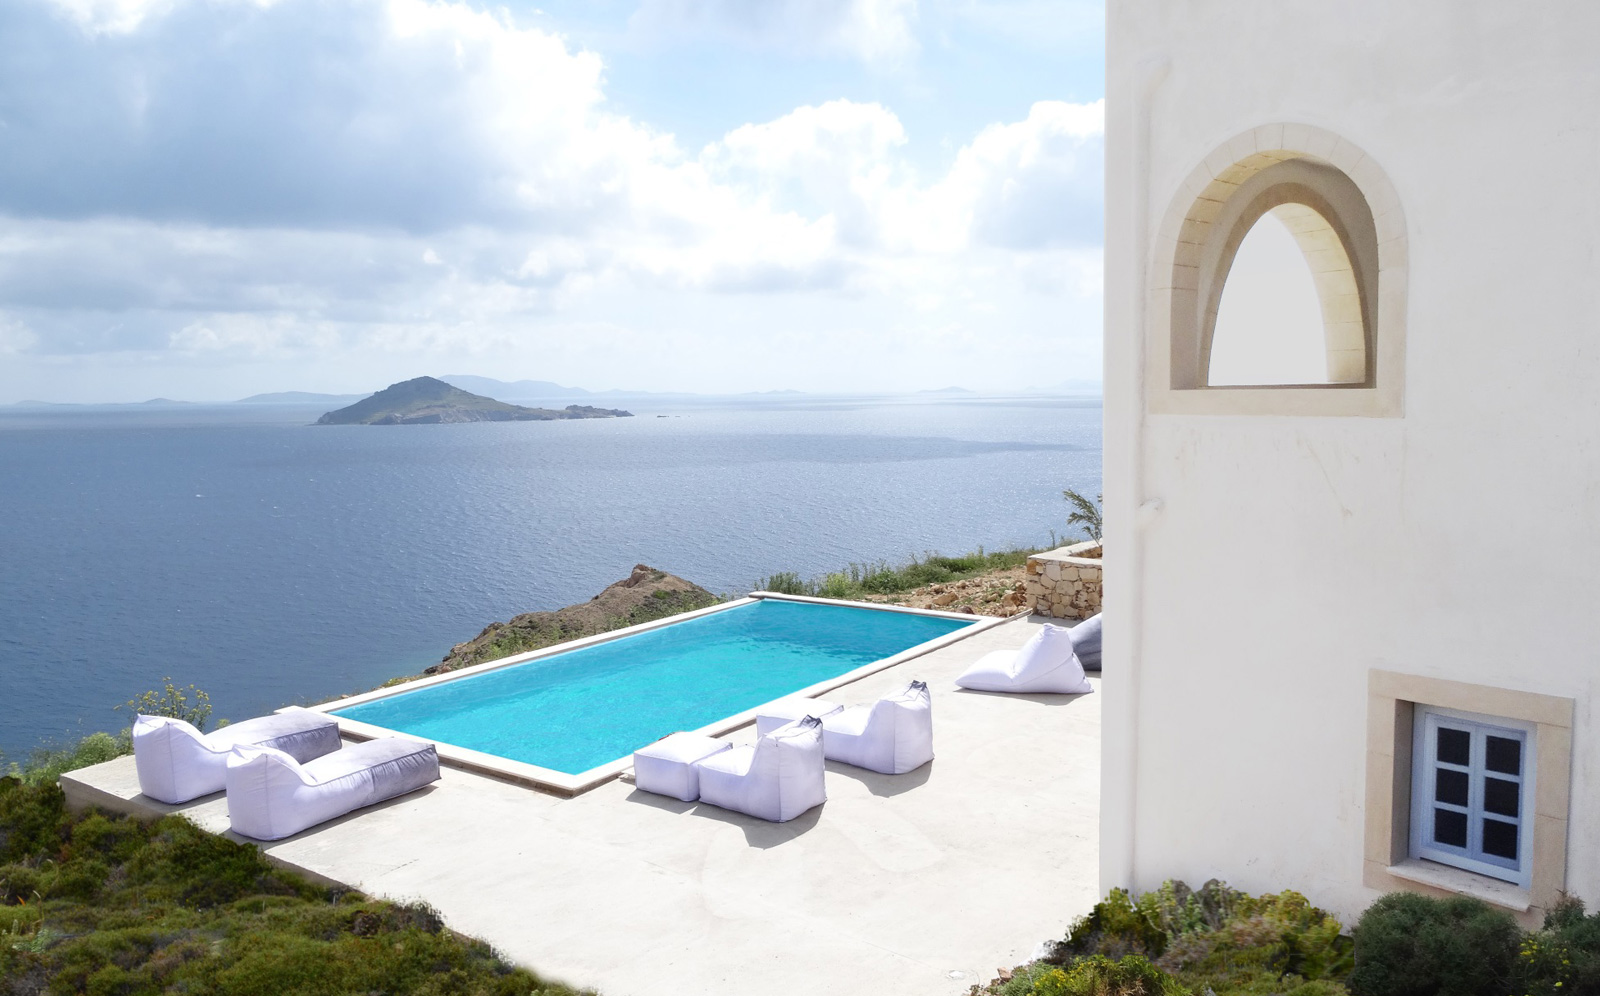 Patmos Villa Denise jumbotron image